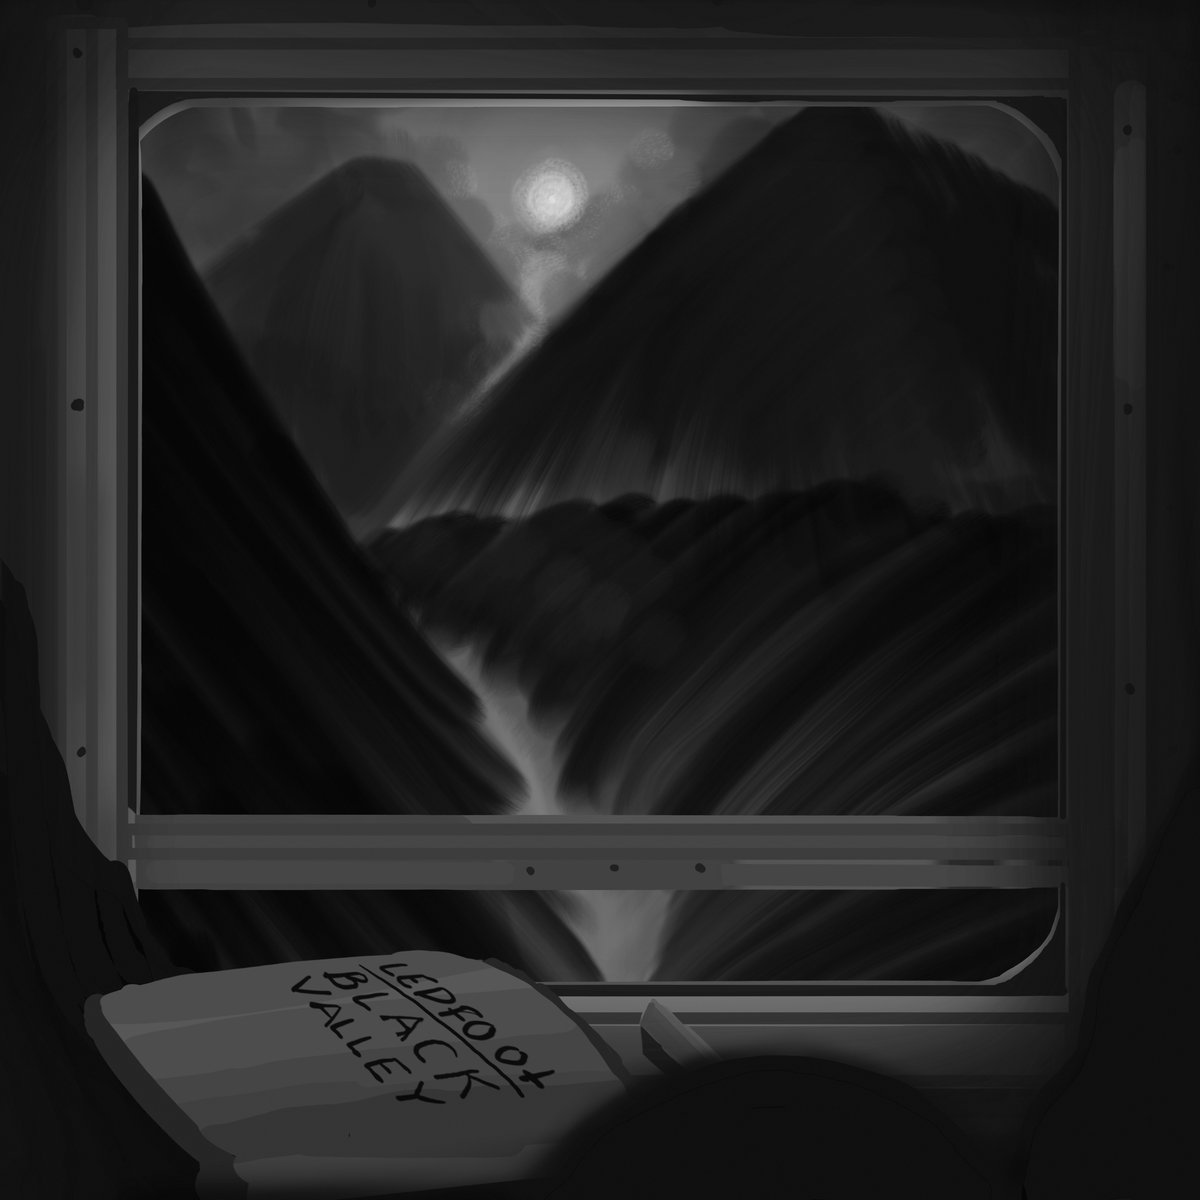 Ledfoot - Black Valley